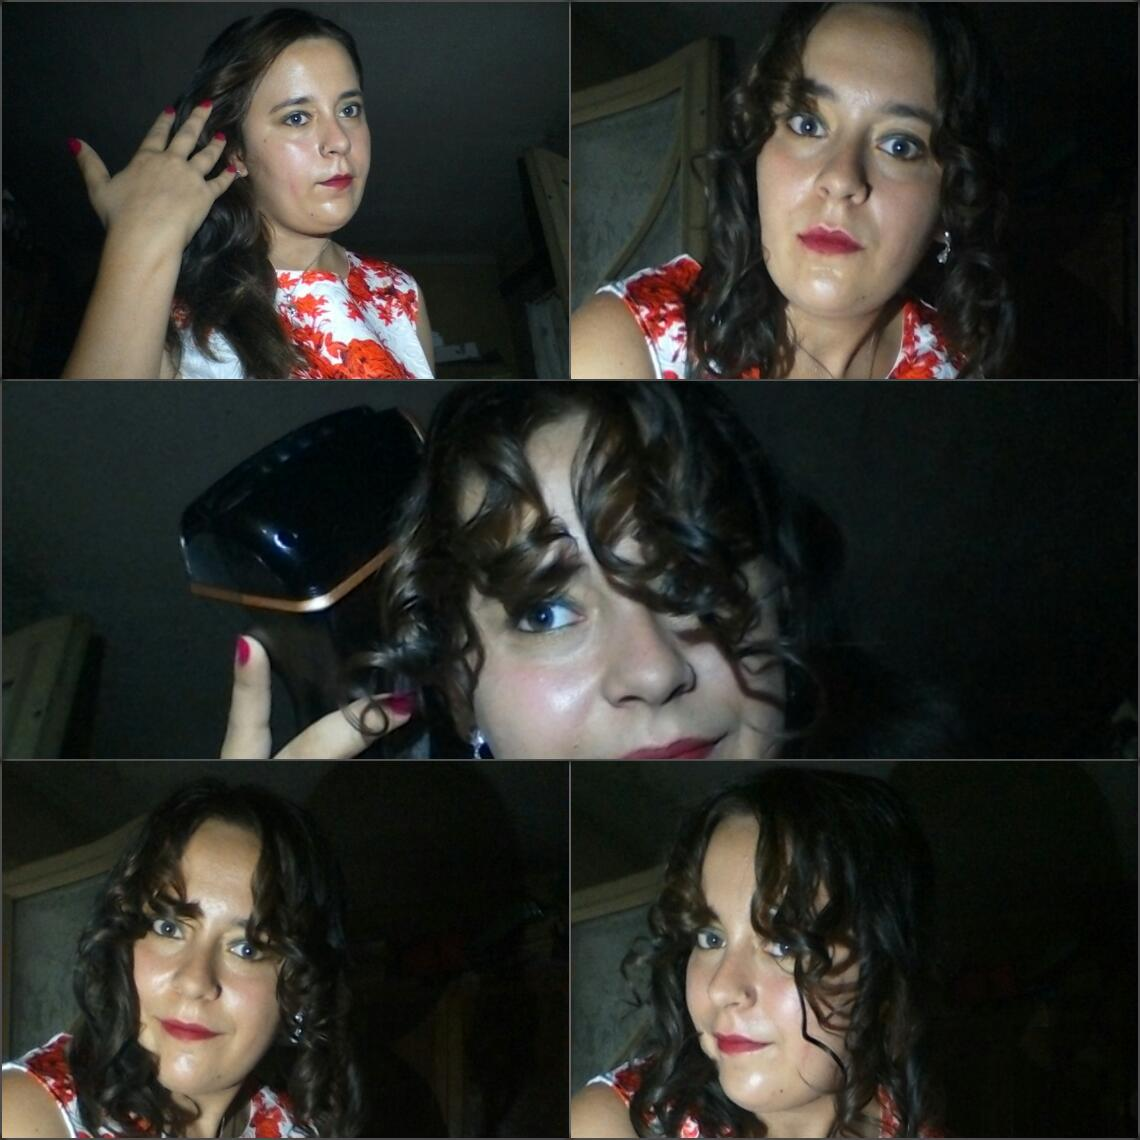 Rowenta Expertise So Curls Review